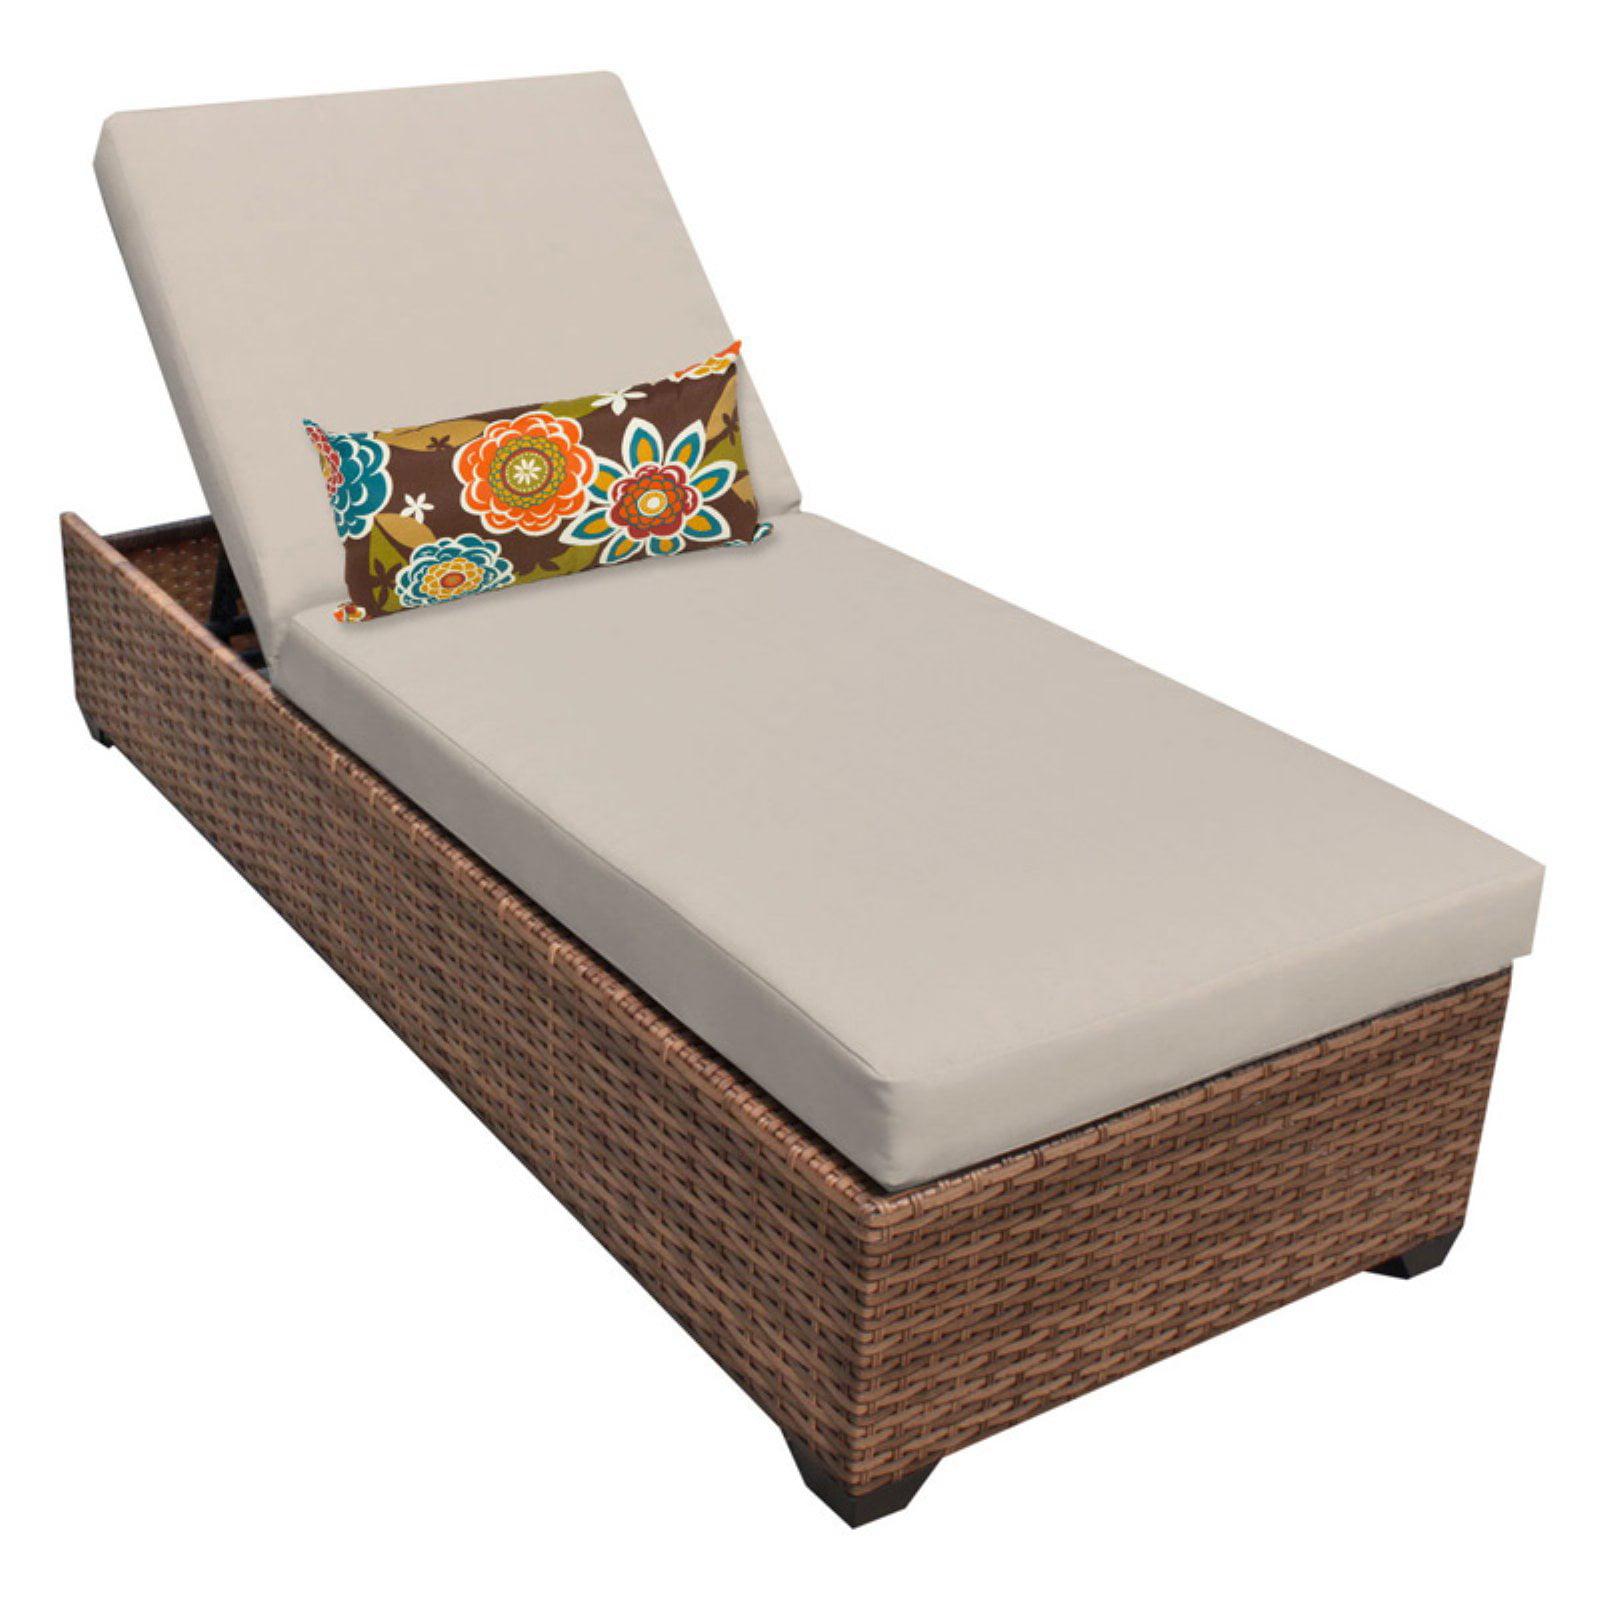 TK Classics Laguna Outdoor Chaise Lounge - Set of 2 Cushion Covers